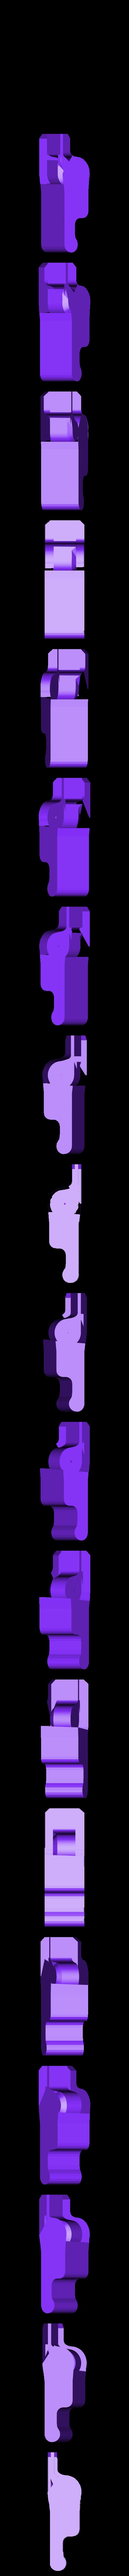 whisleOpenerV2.1.stl Download free STL file Whistle Opener • 3D print design, Azagal